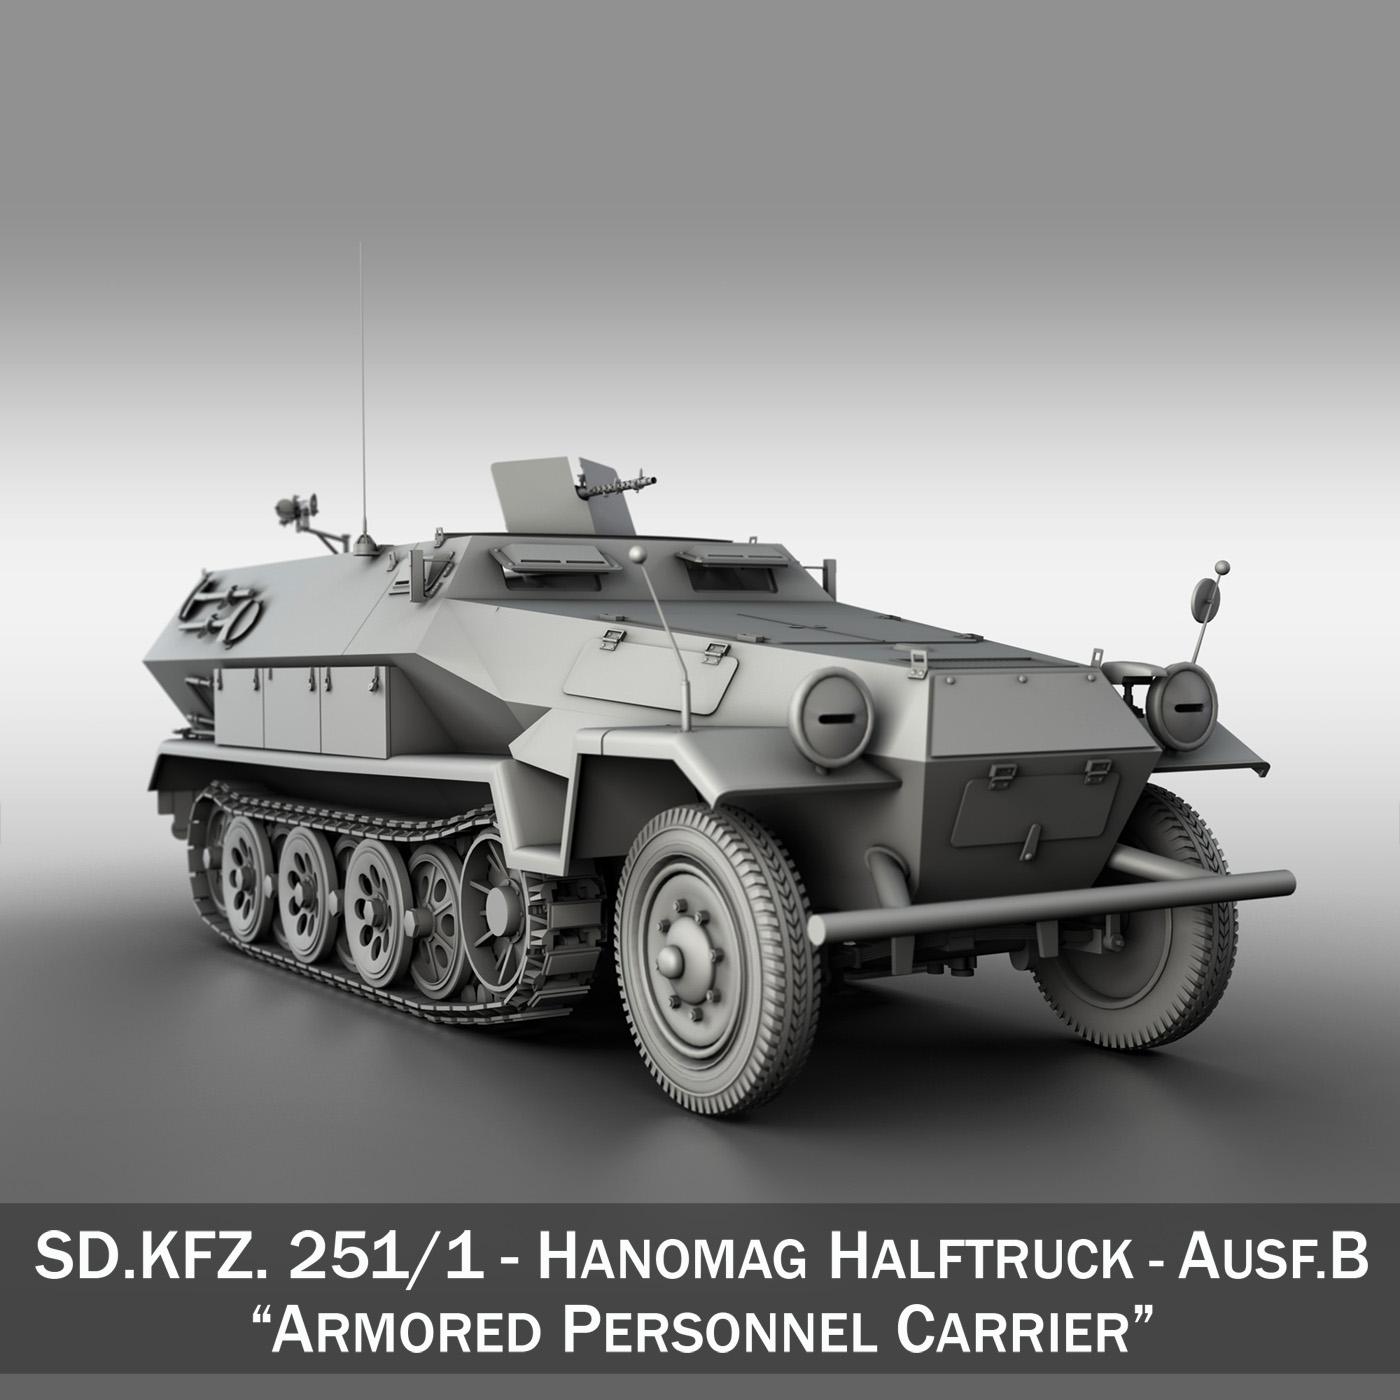 sd.kfz 251/1 ausf.b – hanomag halftruck 3d model 3ds fbx c4d lwo obj 201159